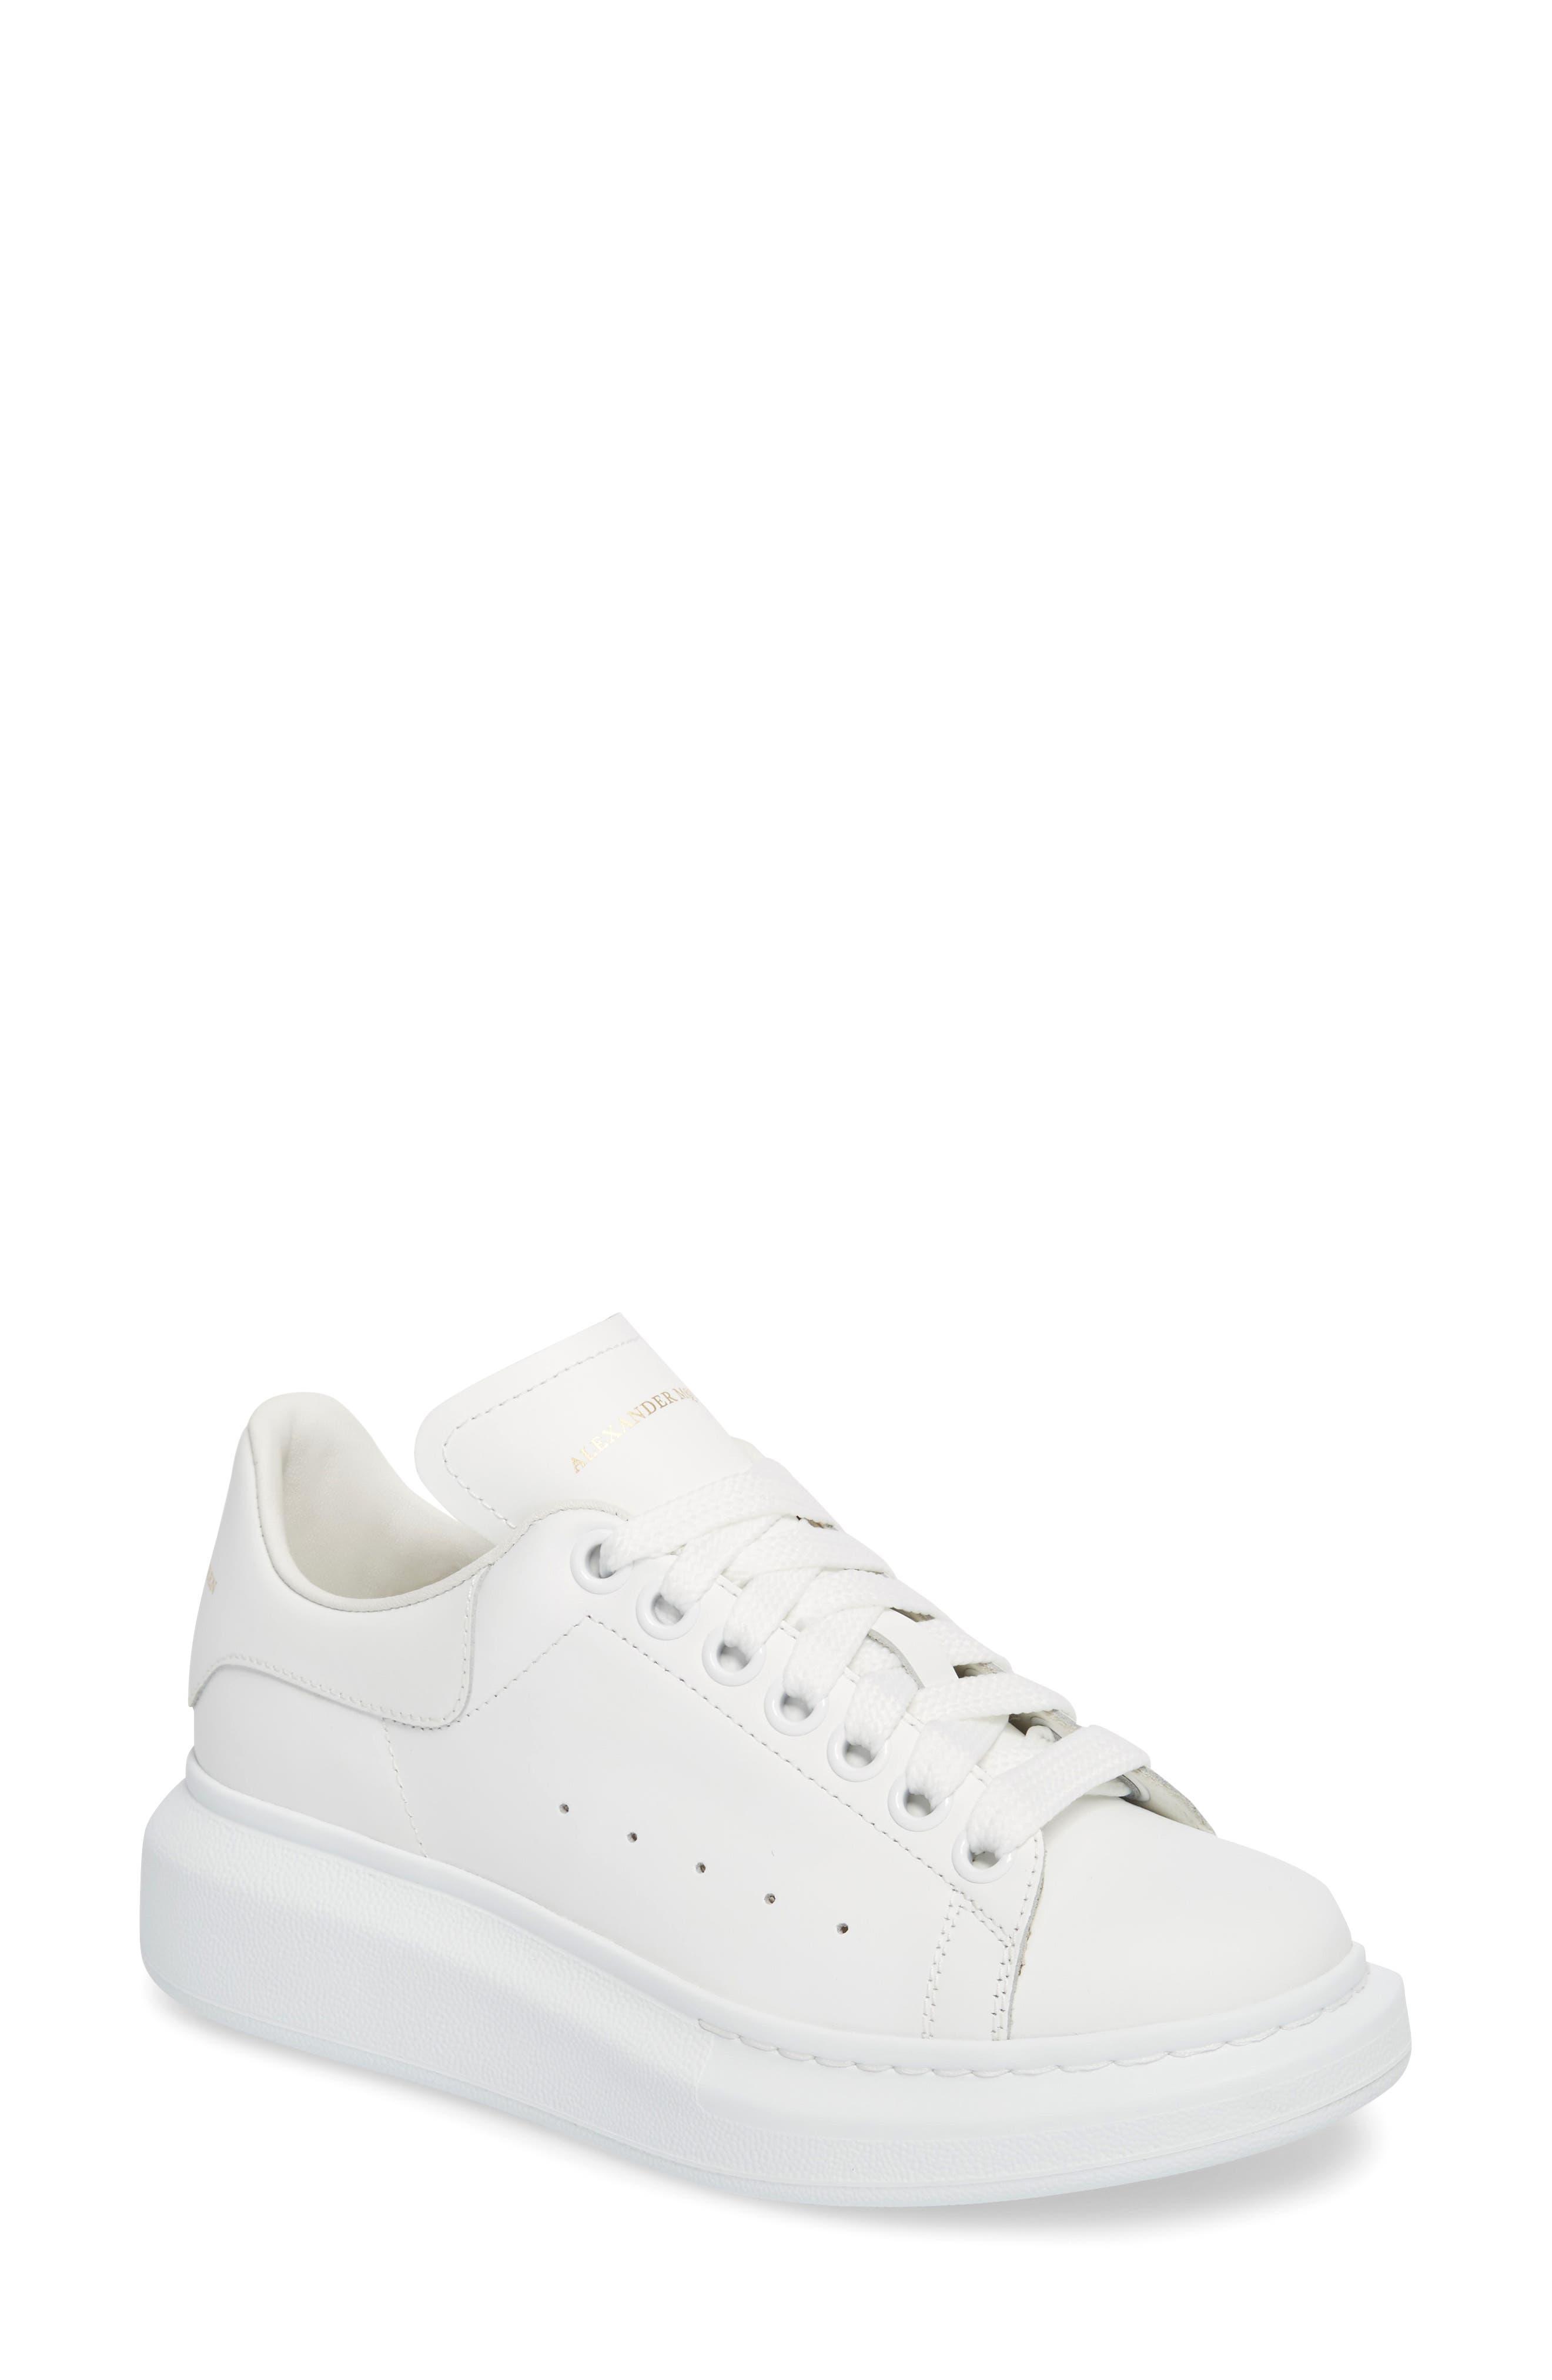 Alexander Mcqueen Sneaker, White